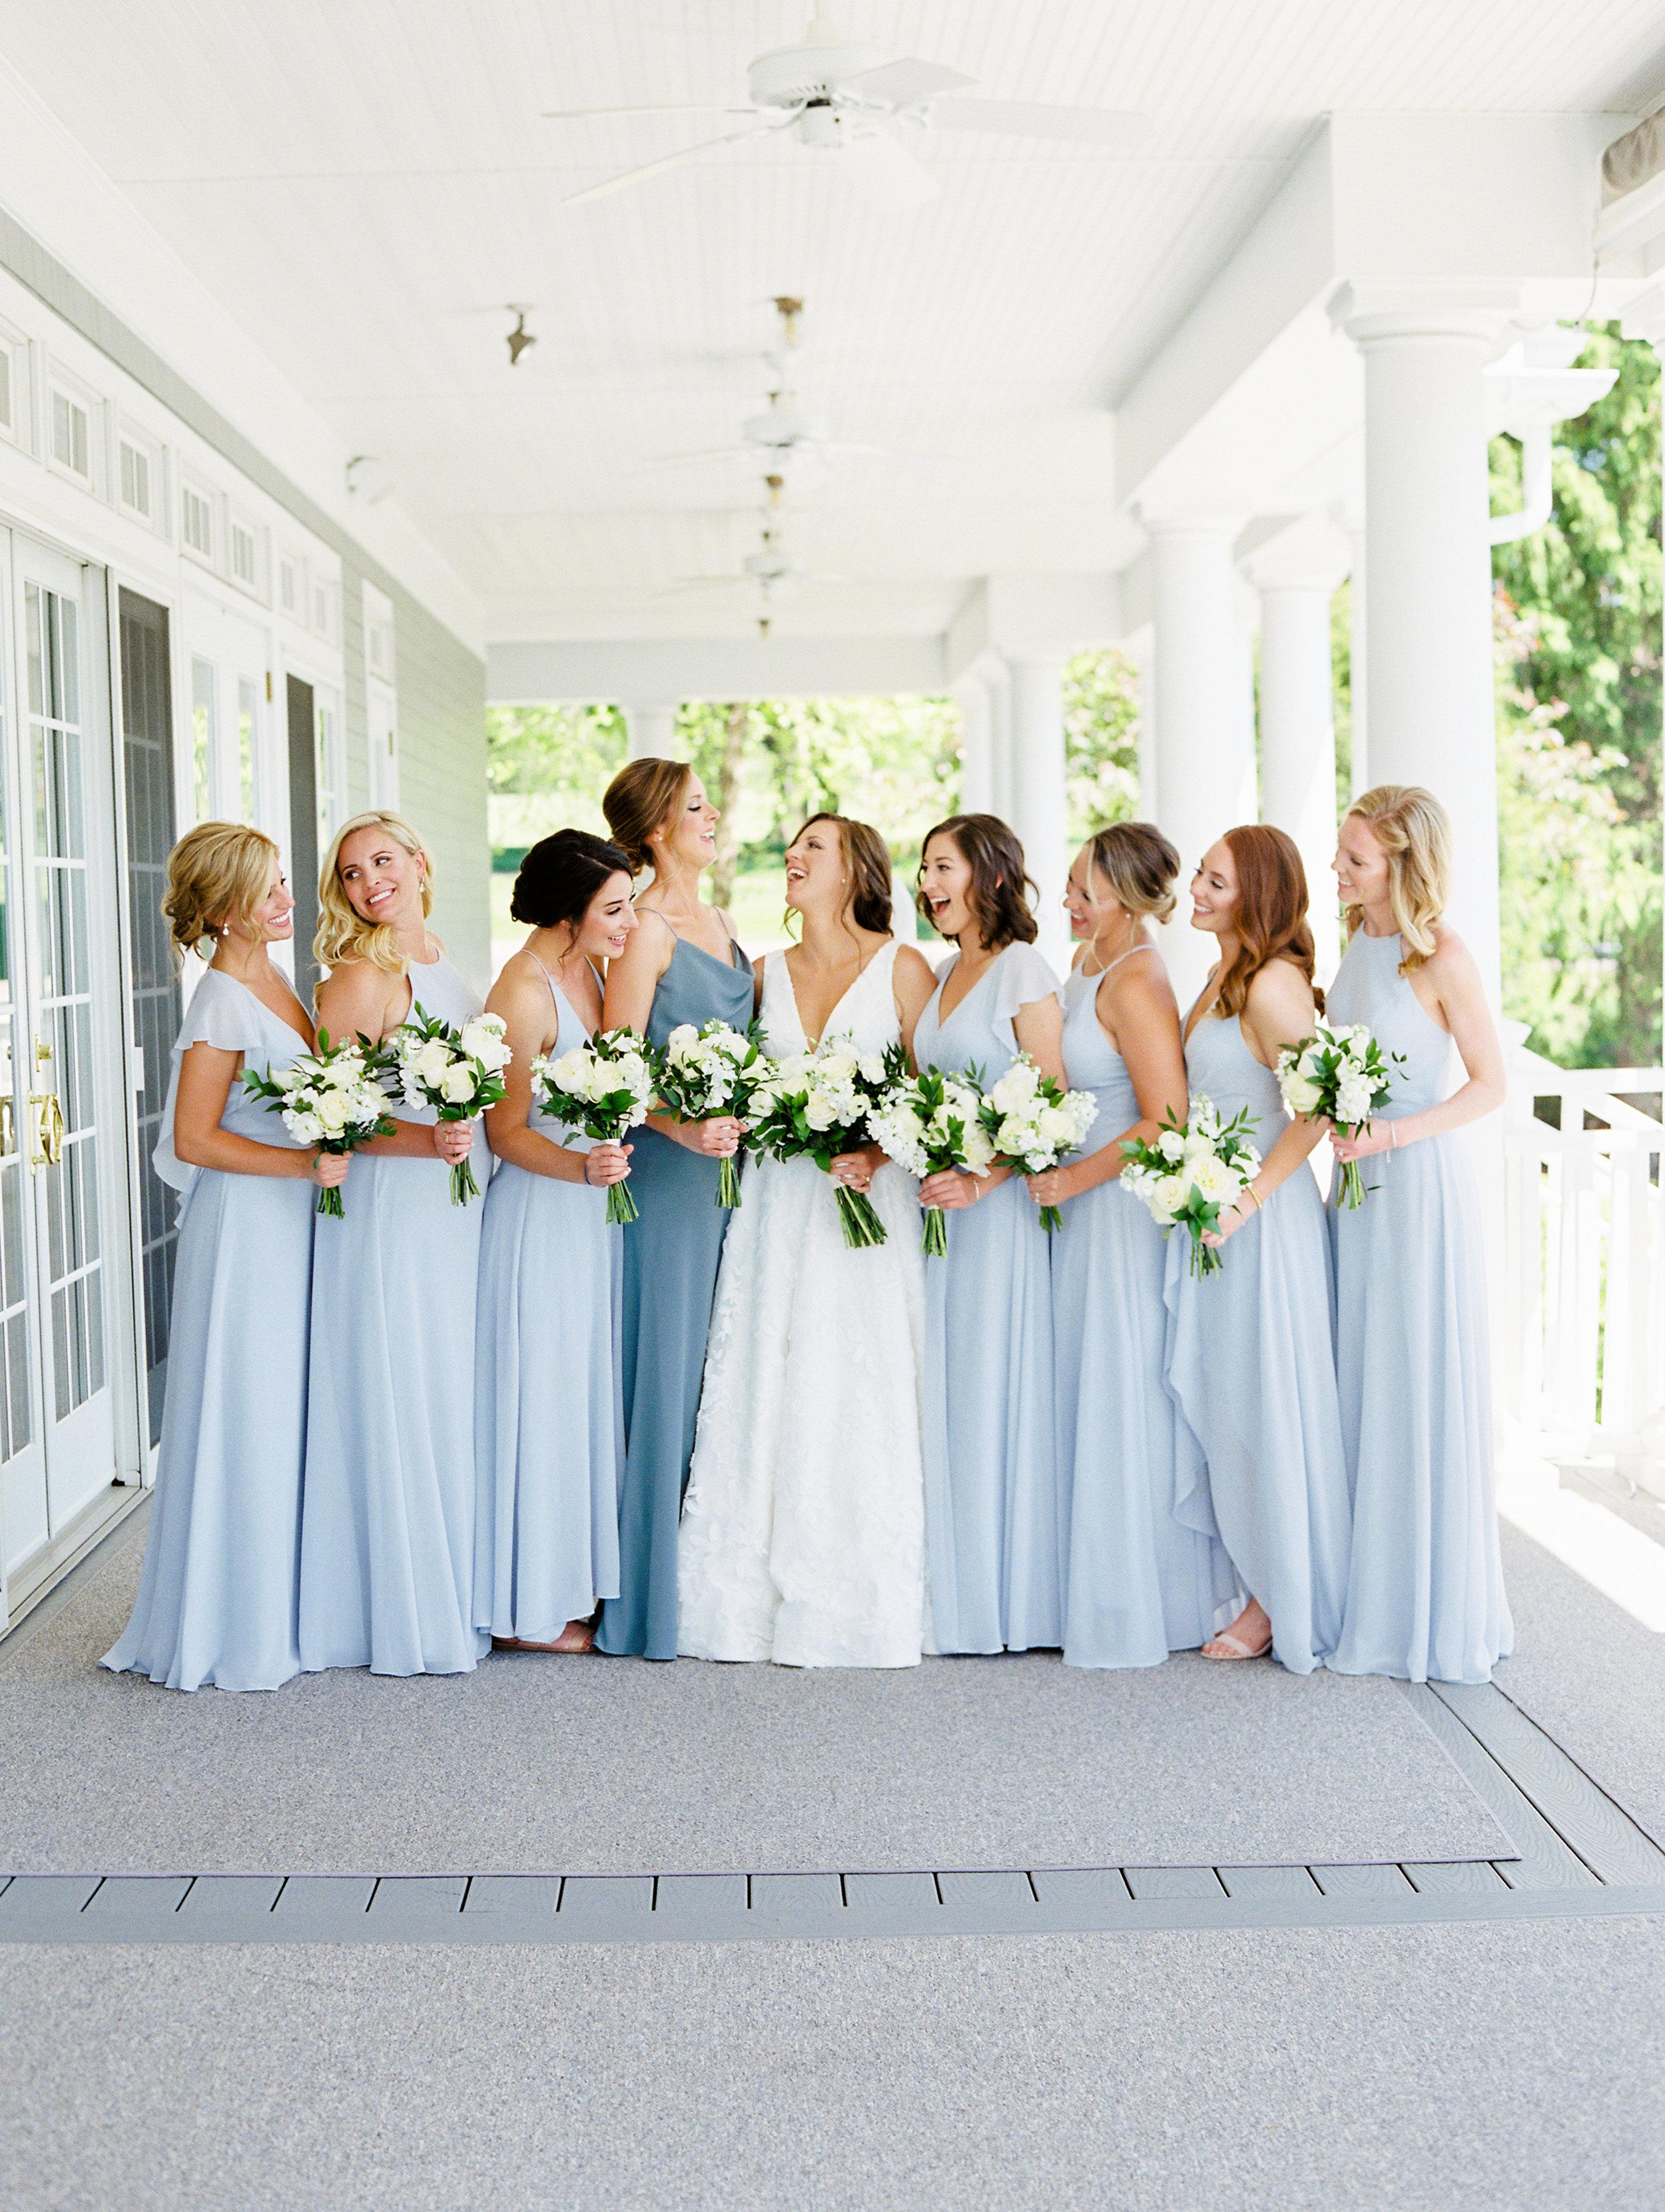 DeGuilio+Wedding+Bridal+Partyf-7.jpg